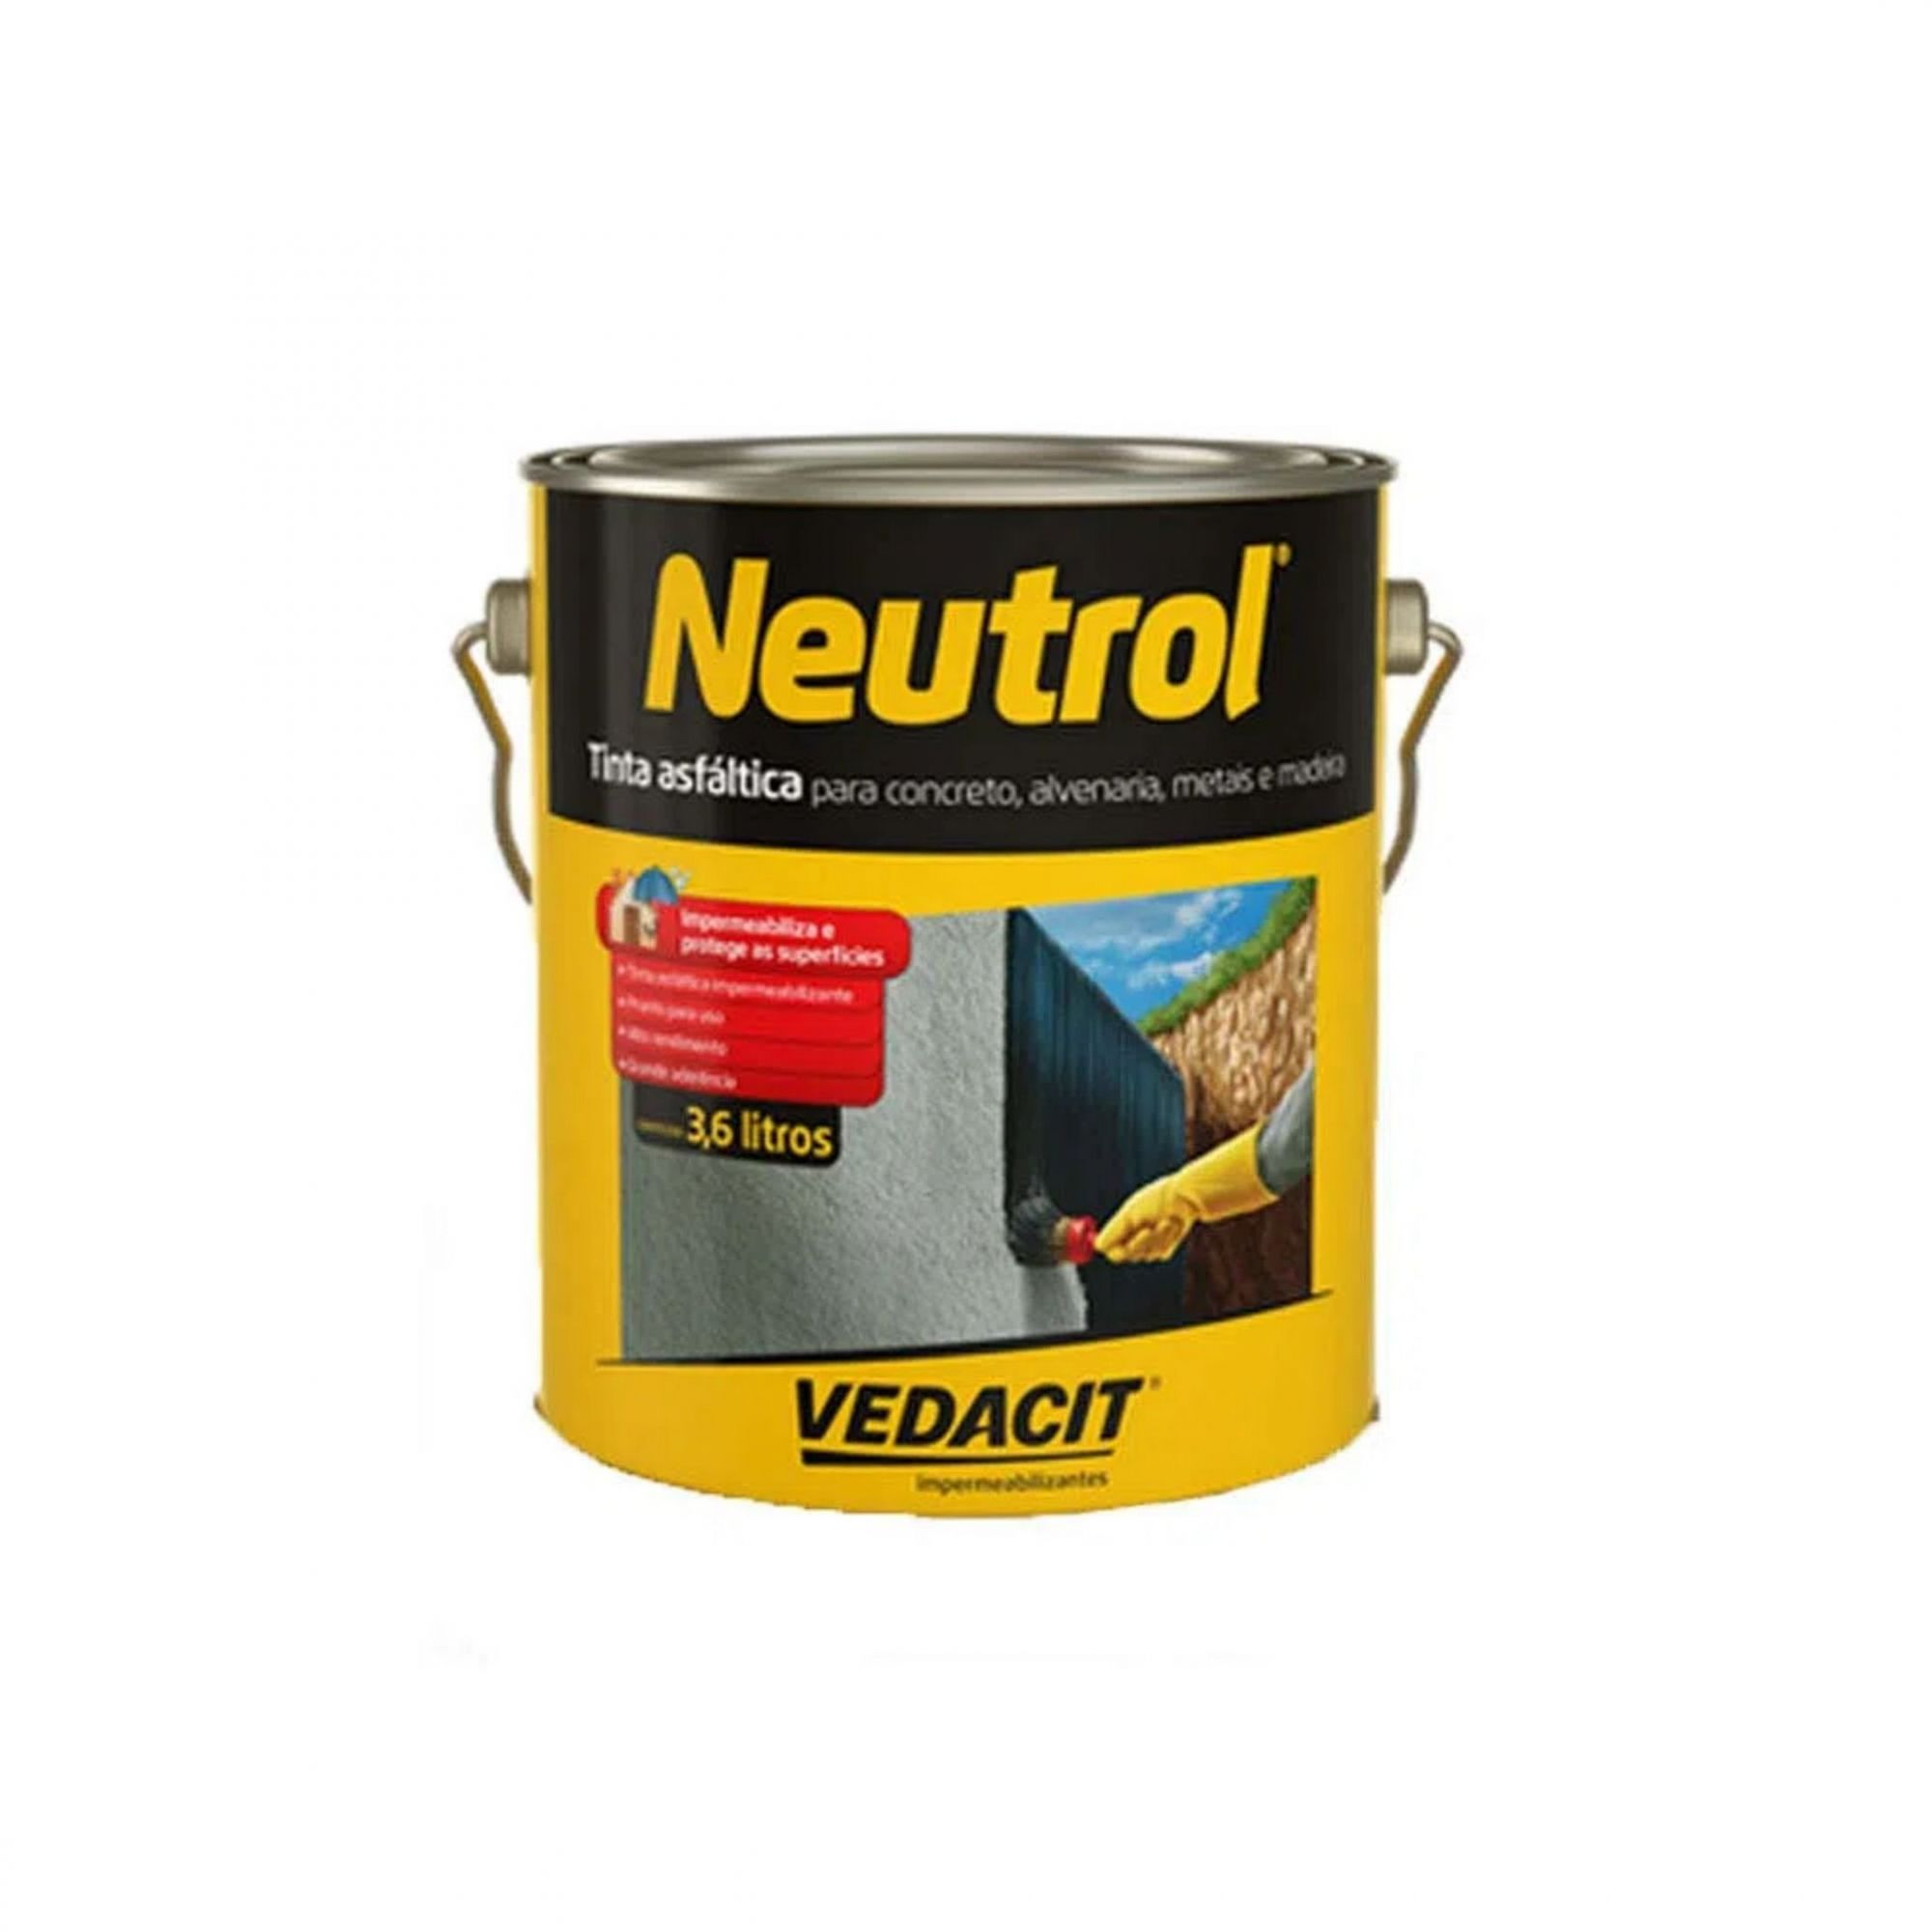 Tinta Asfáltica Neutrol 3,6 Litros Vedacit